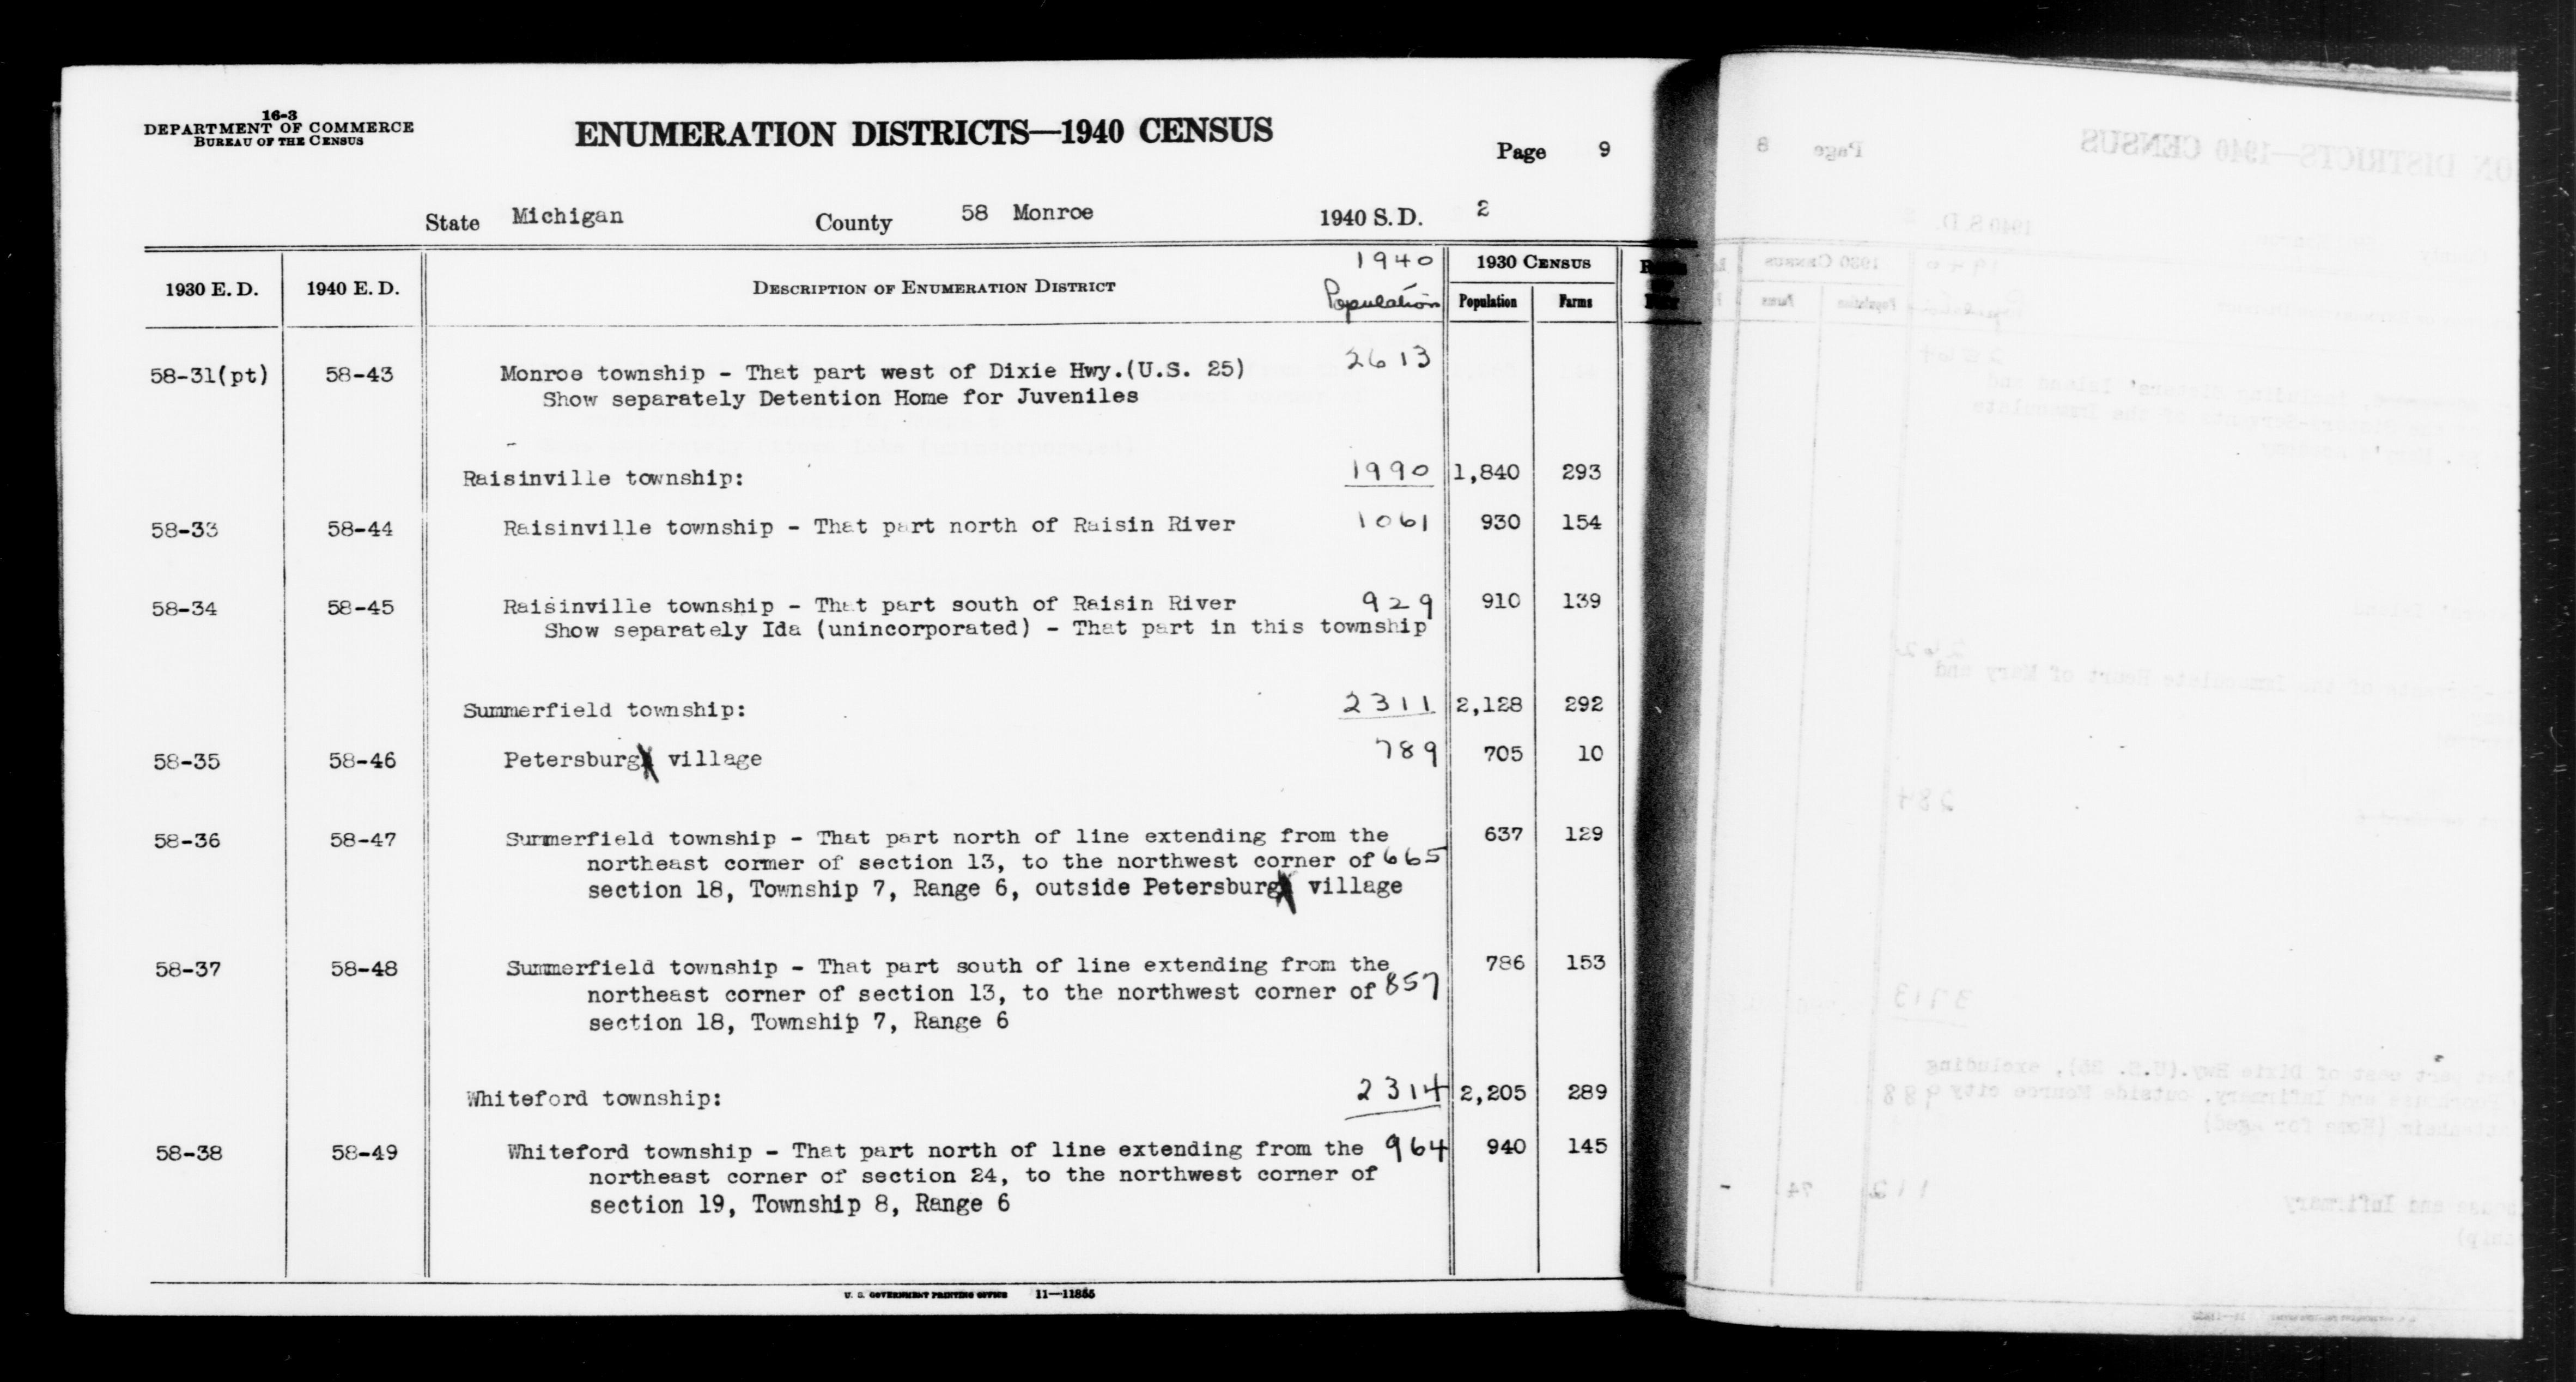 1940 Census Enumeration District Descriptions - Michigan - Monroe County - ED 58-43, ED 58-44, ED 58-45, ED 58-46, ED 58-47, ED 58-48, ED 58-49